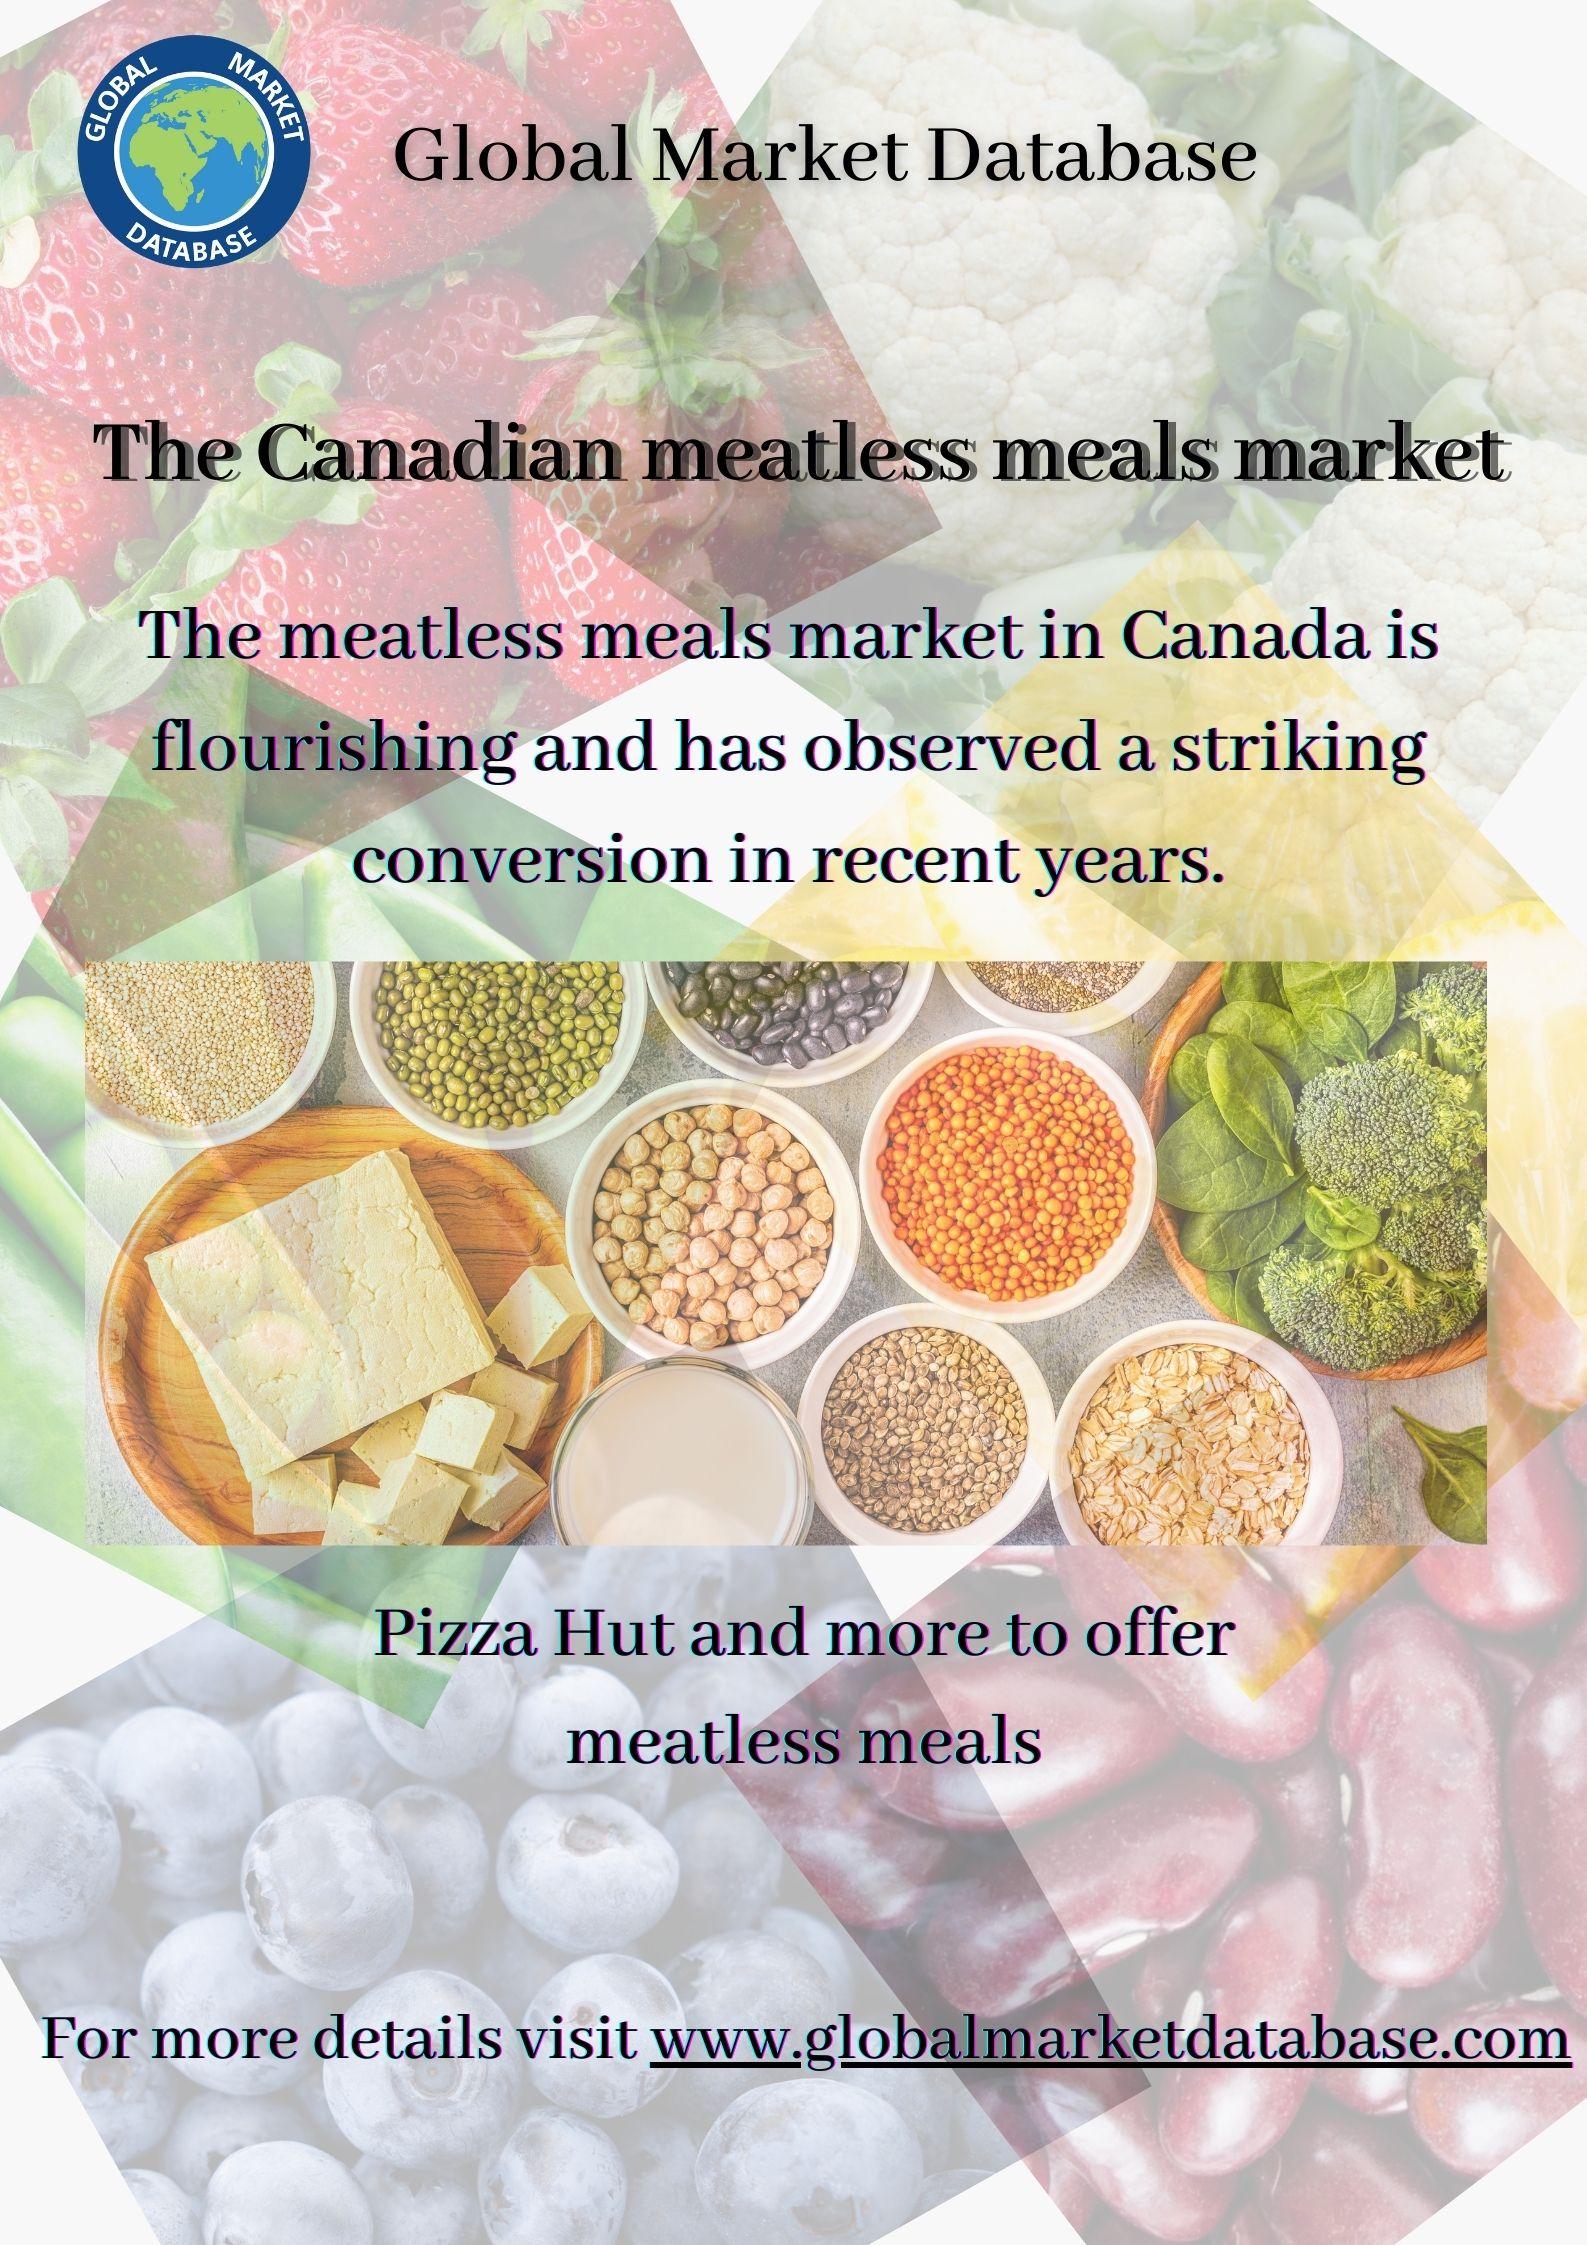 Meatless Market in Canada